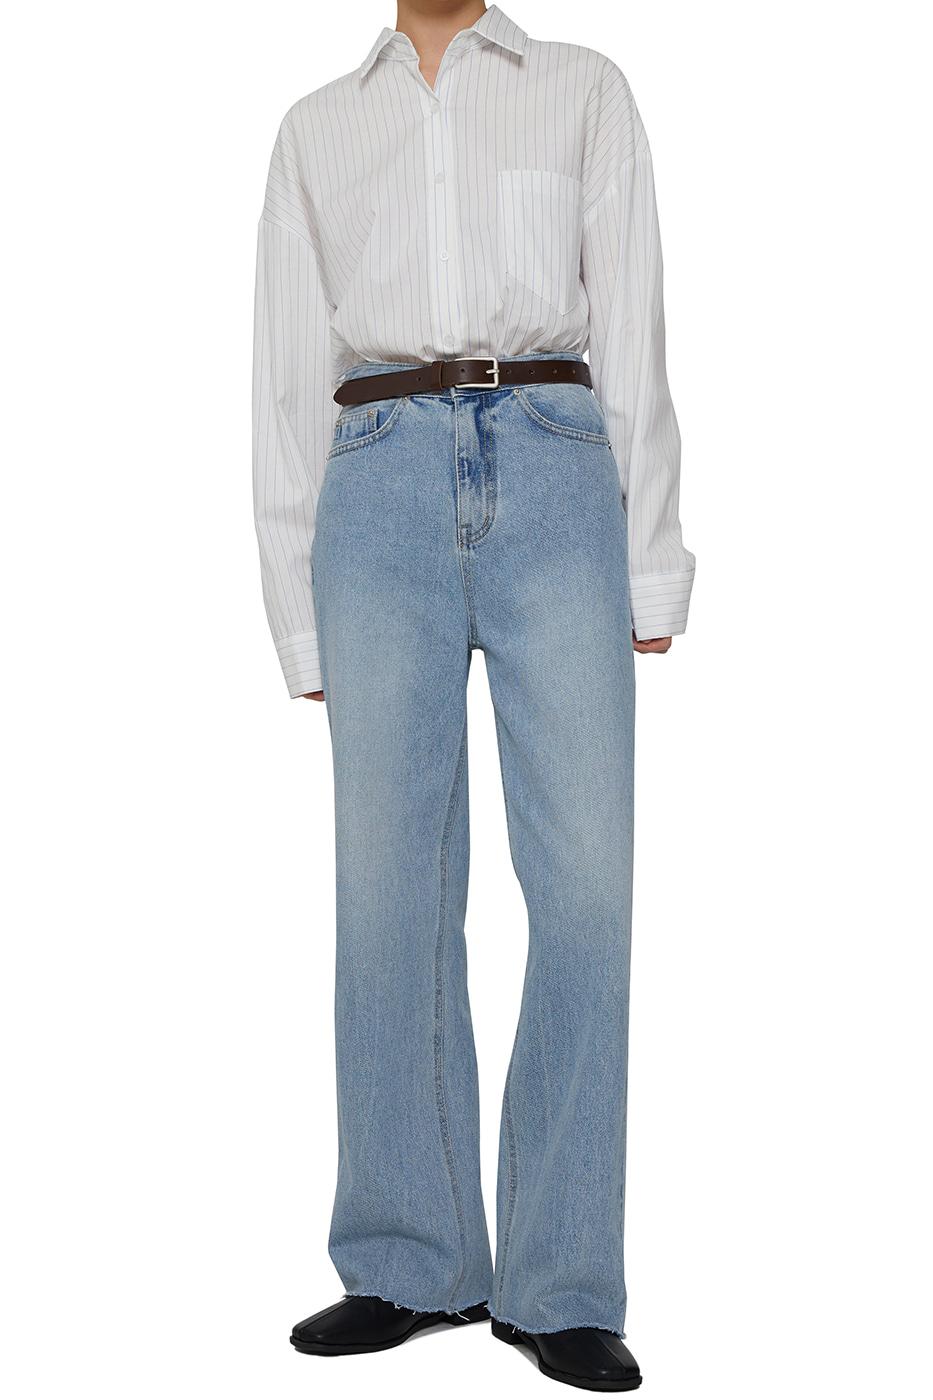 Sunset straight jeans